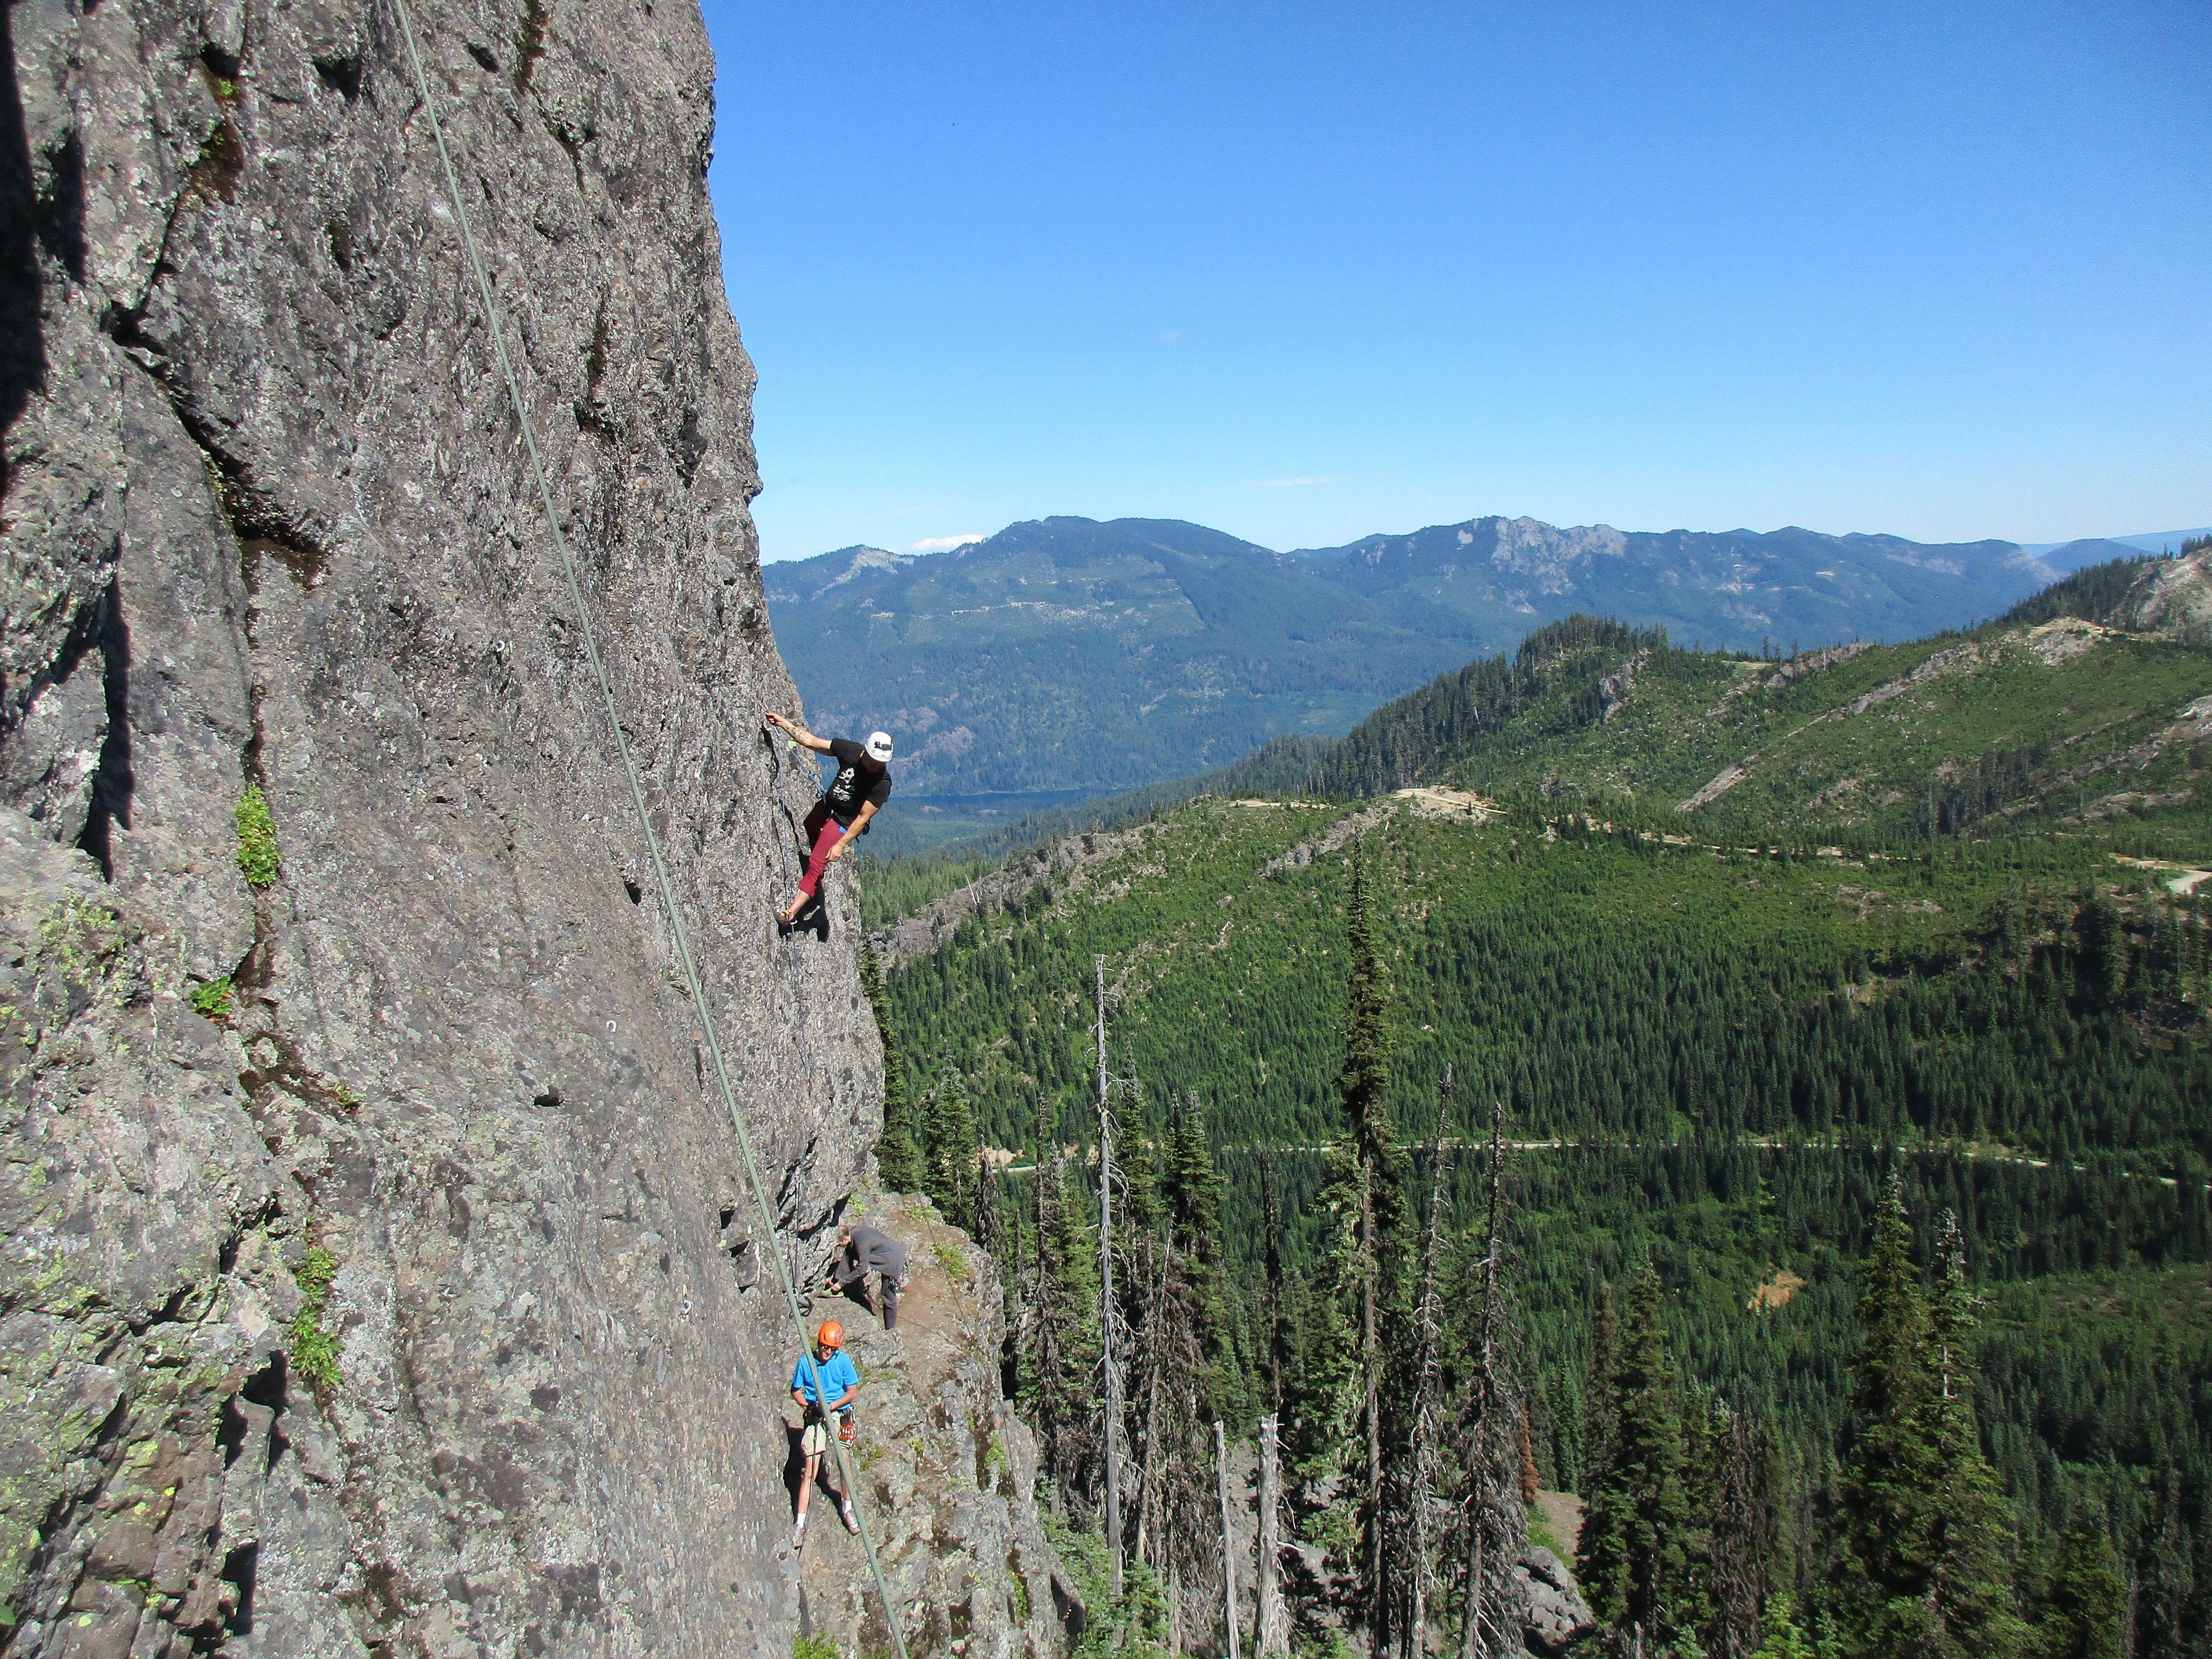 Seattle Climbing